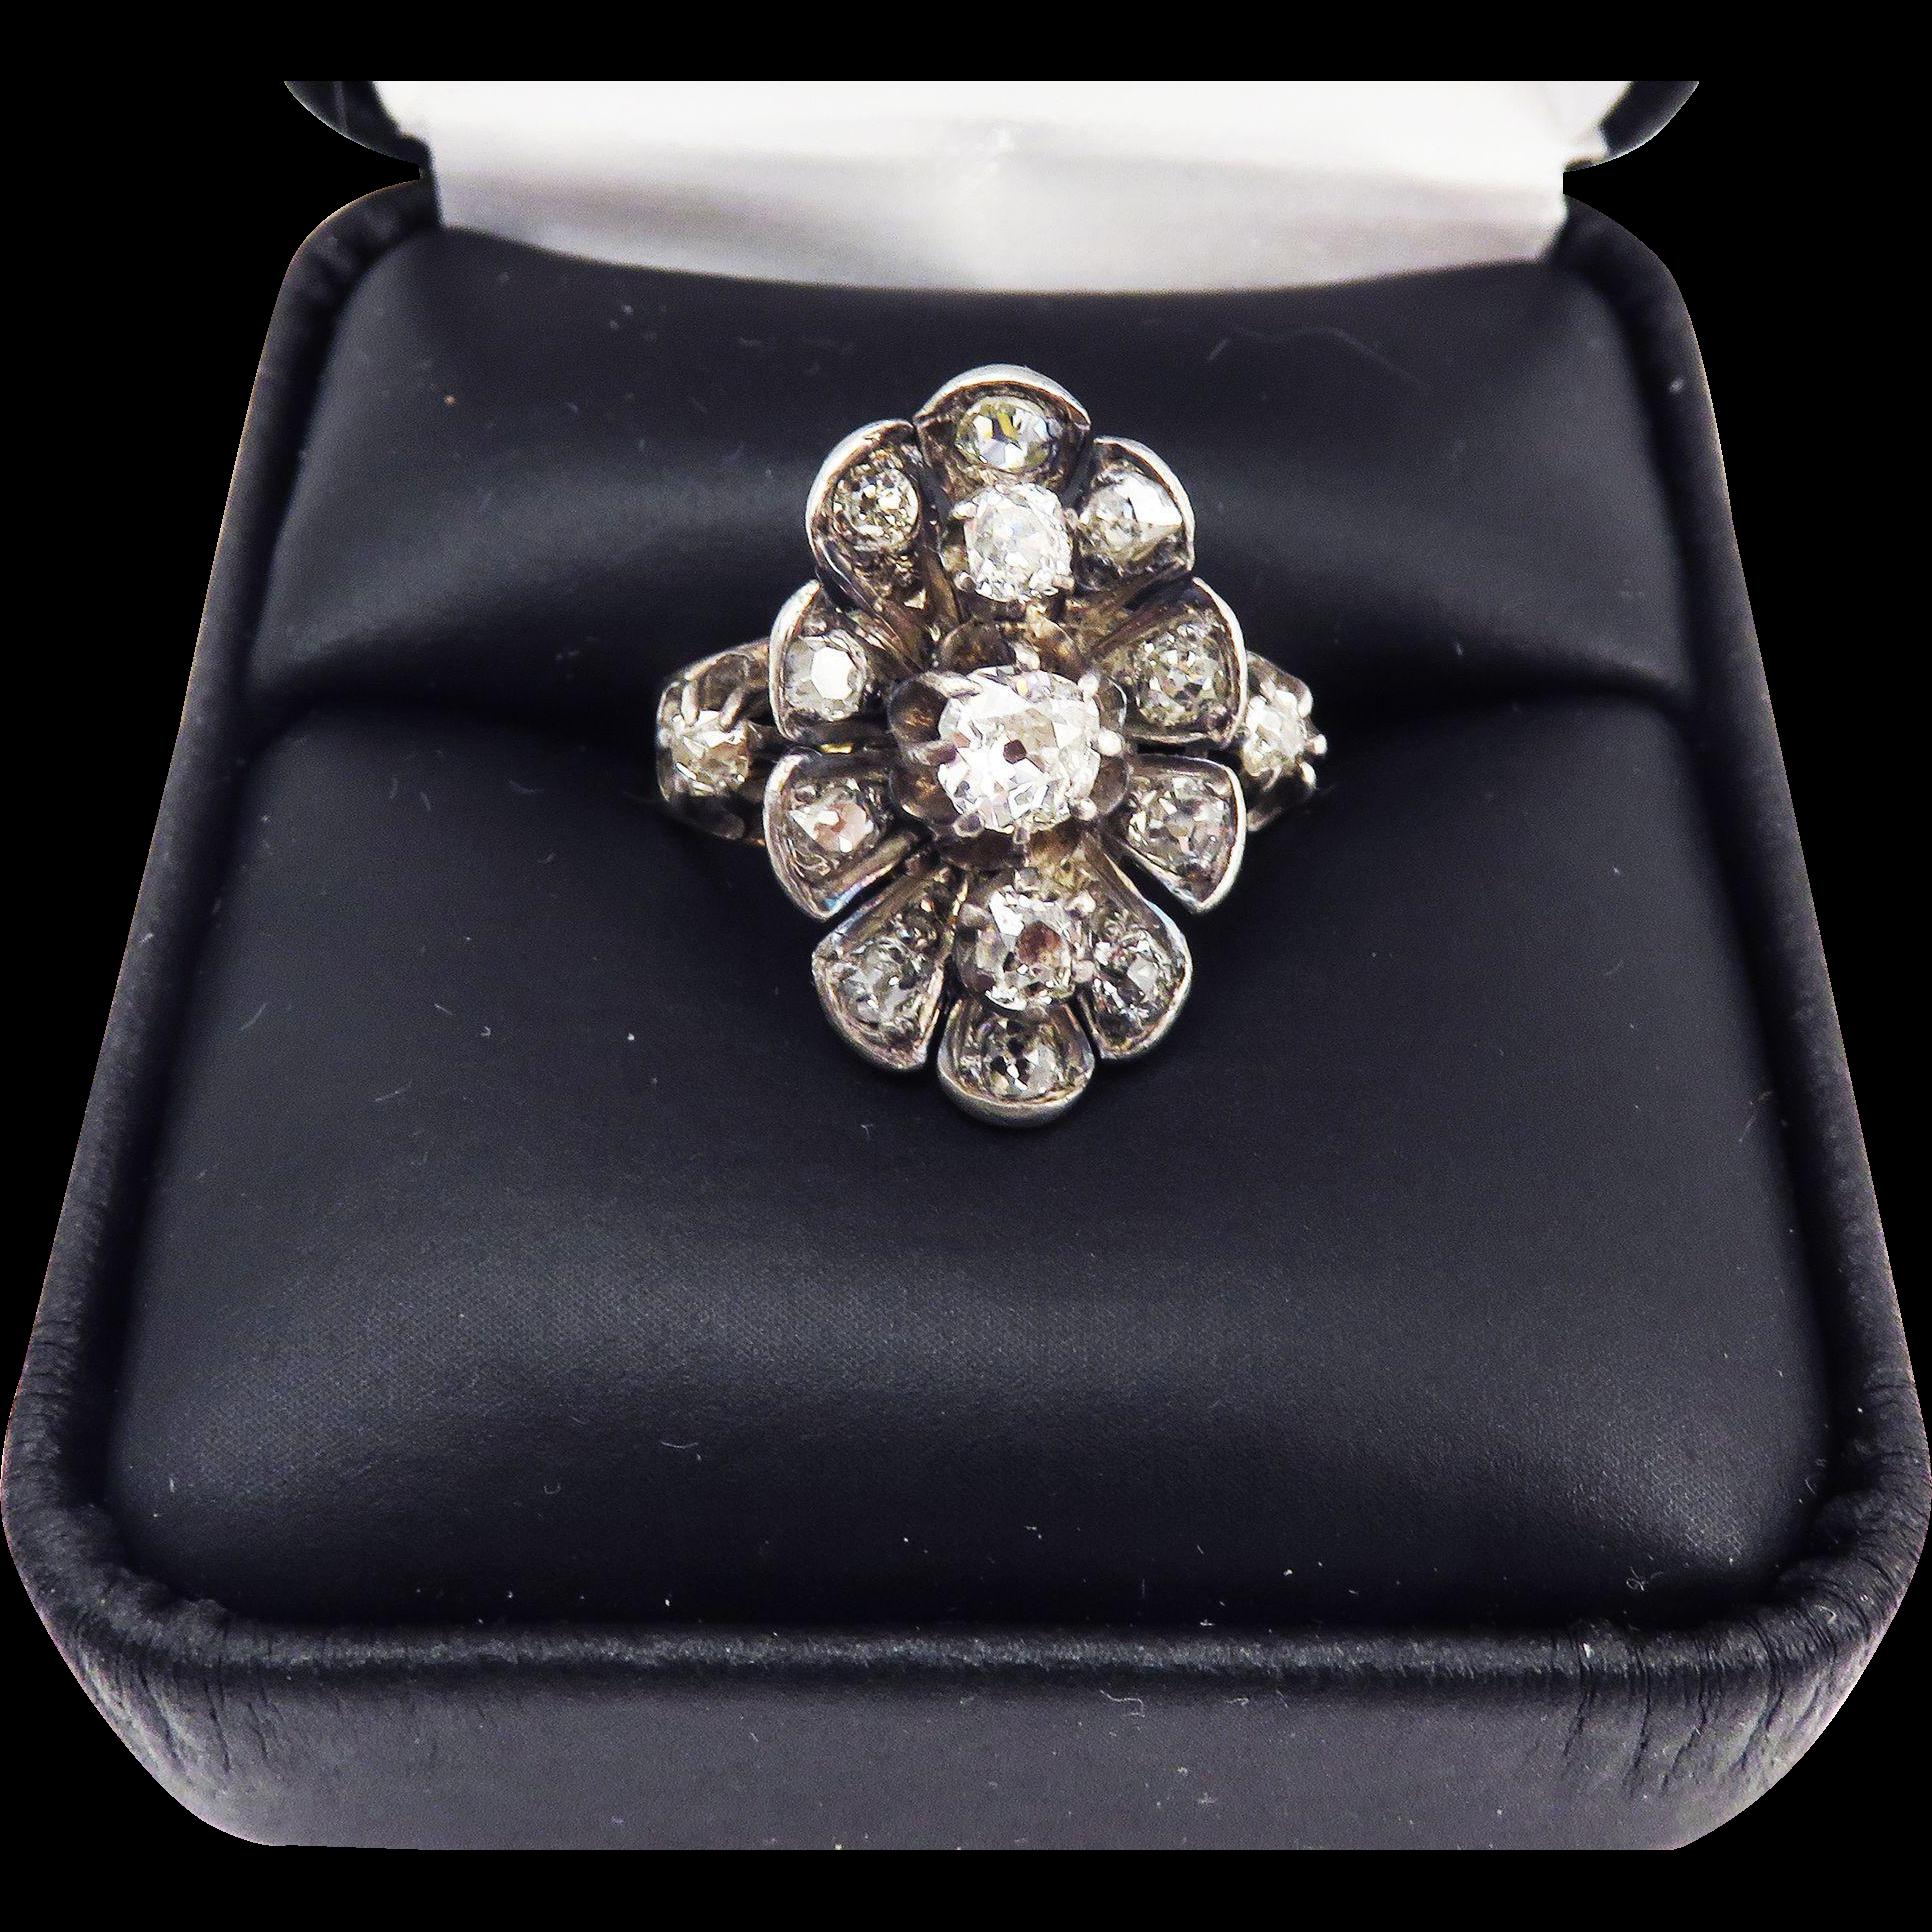 UNIQUELY Gorgeous 1.02 Ct. TW Victorian OMC Diamond/Silver/9k/18k Ring, c.1865!